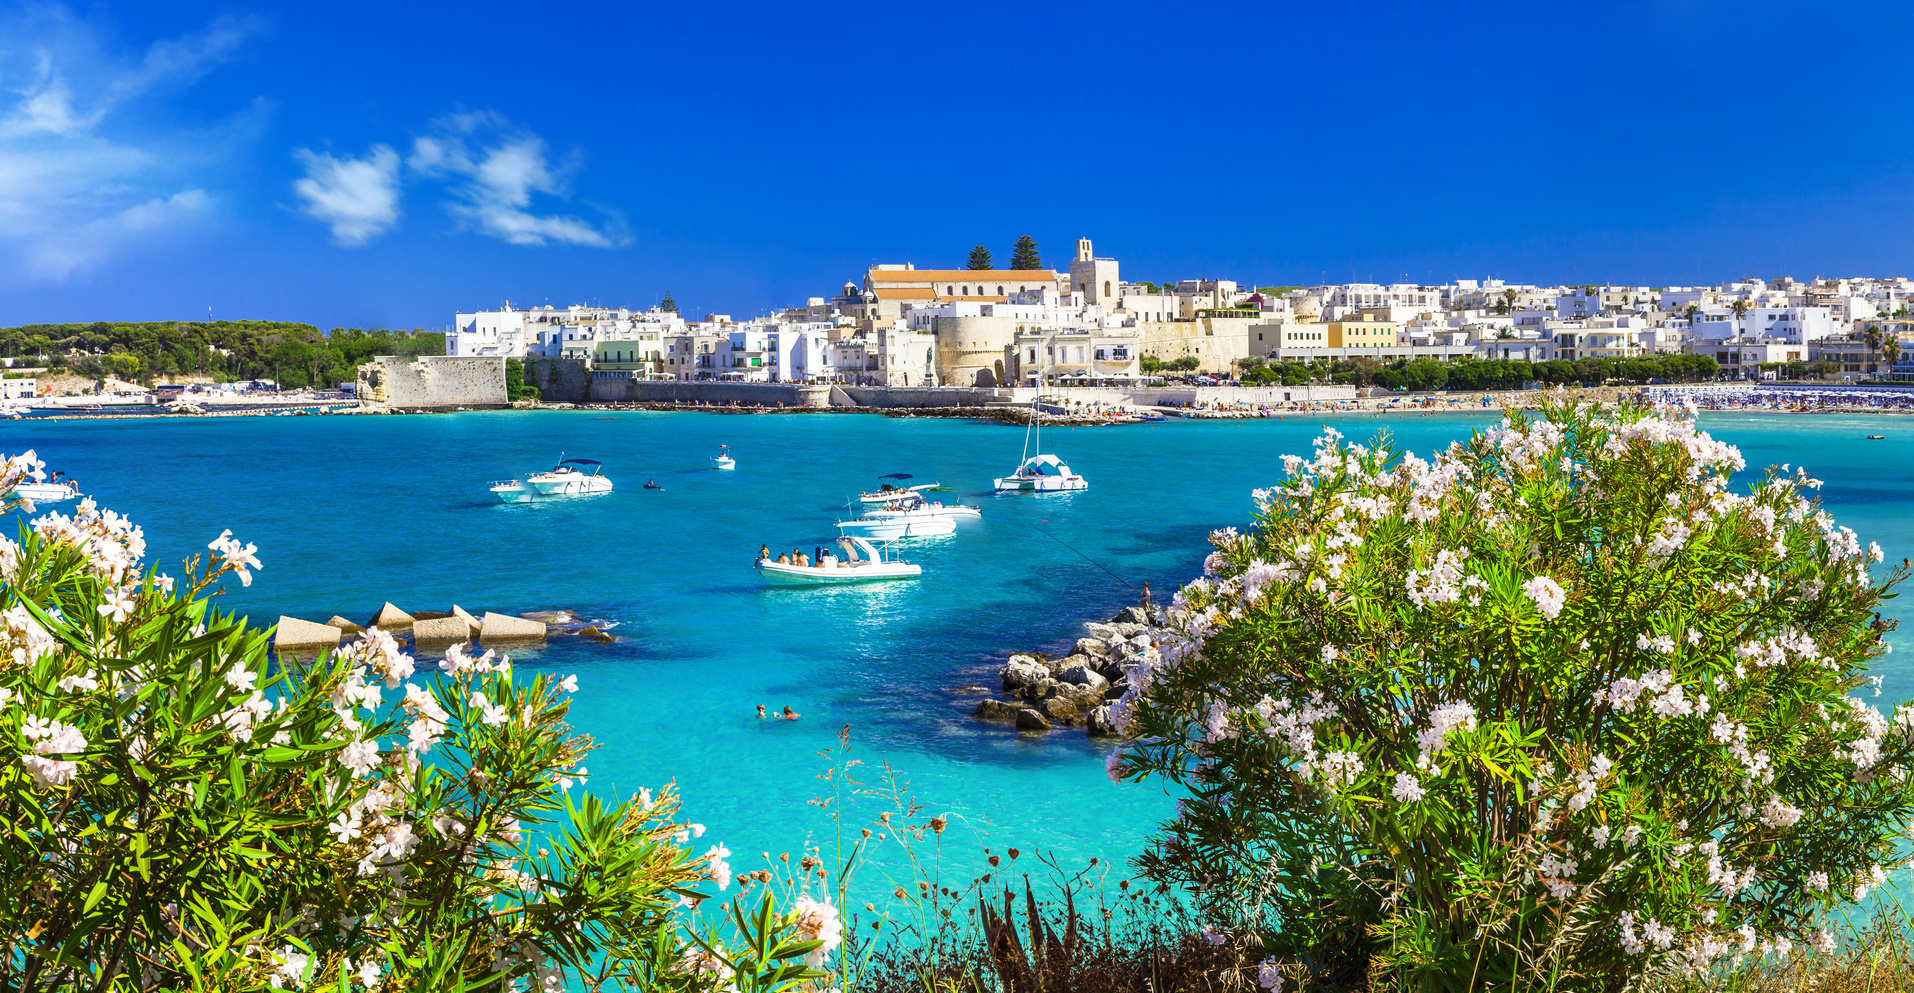 Italian vacation - Otranto in Puglia with cristal waters